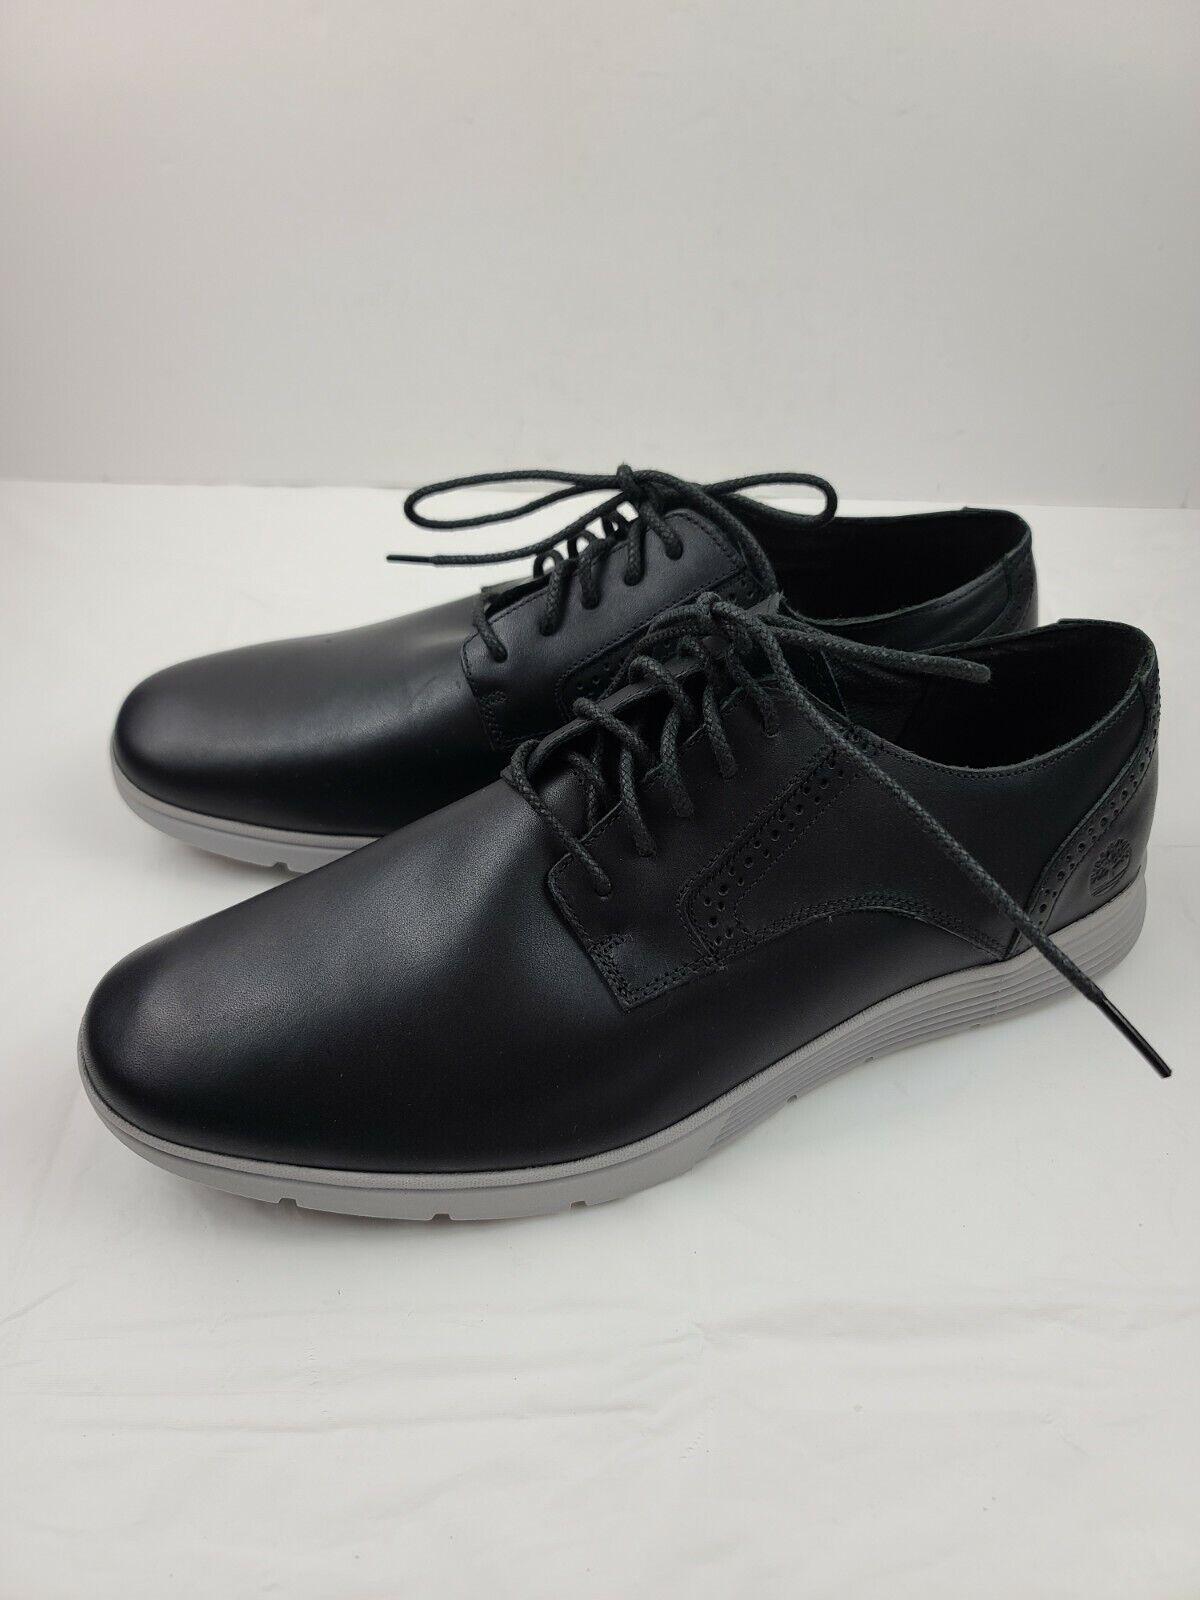 Timberland Franklin Park Ox Lace-Up Sneaker Black Men's Size 12